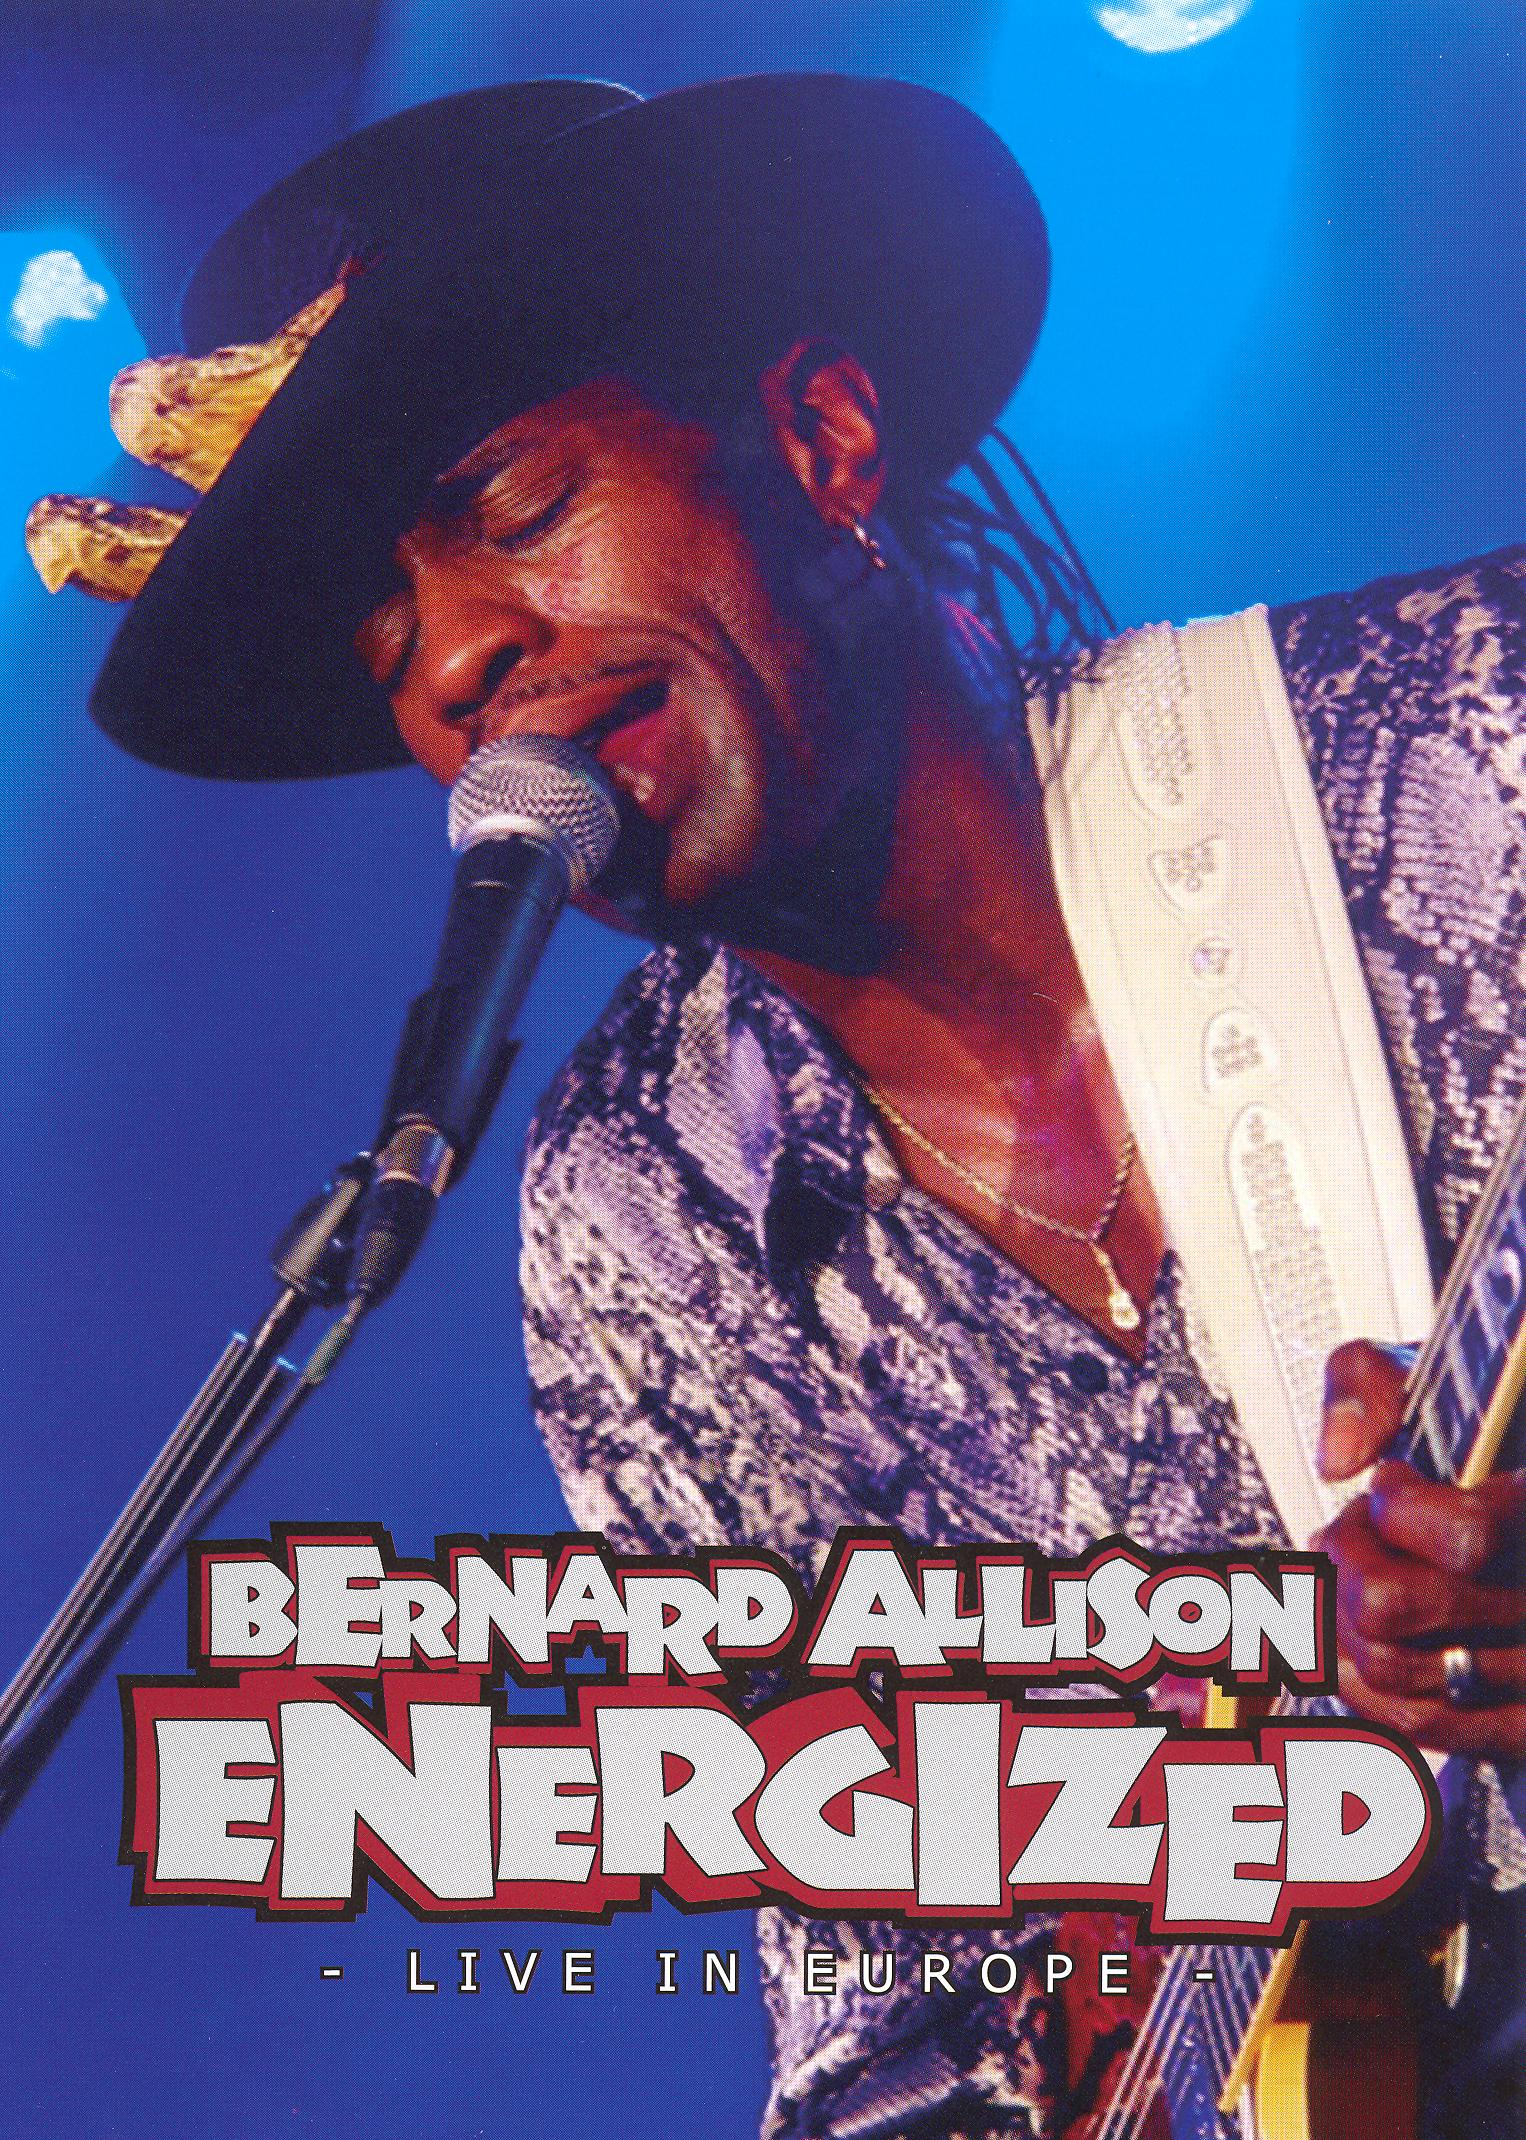 Bernard Allison: Energized - Live in Europe